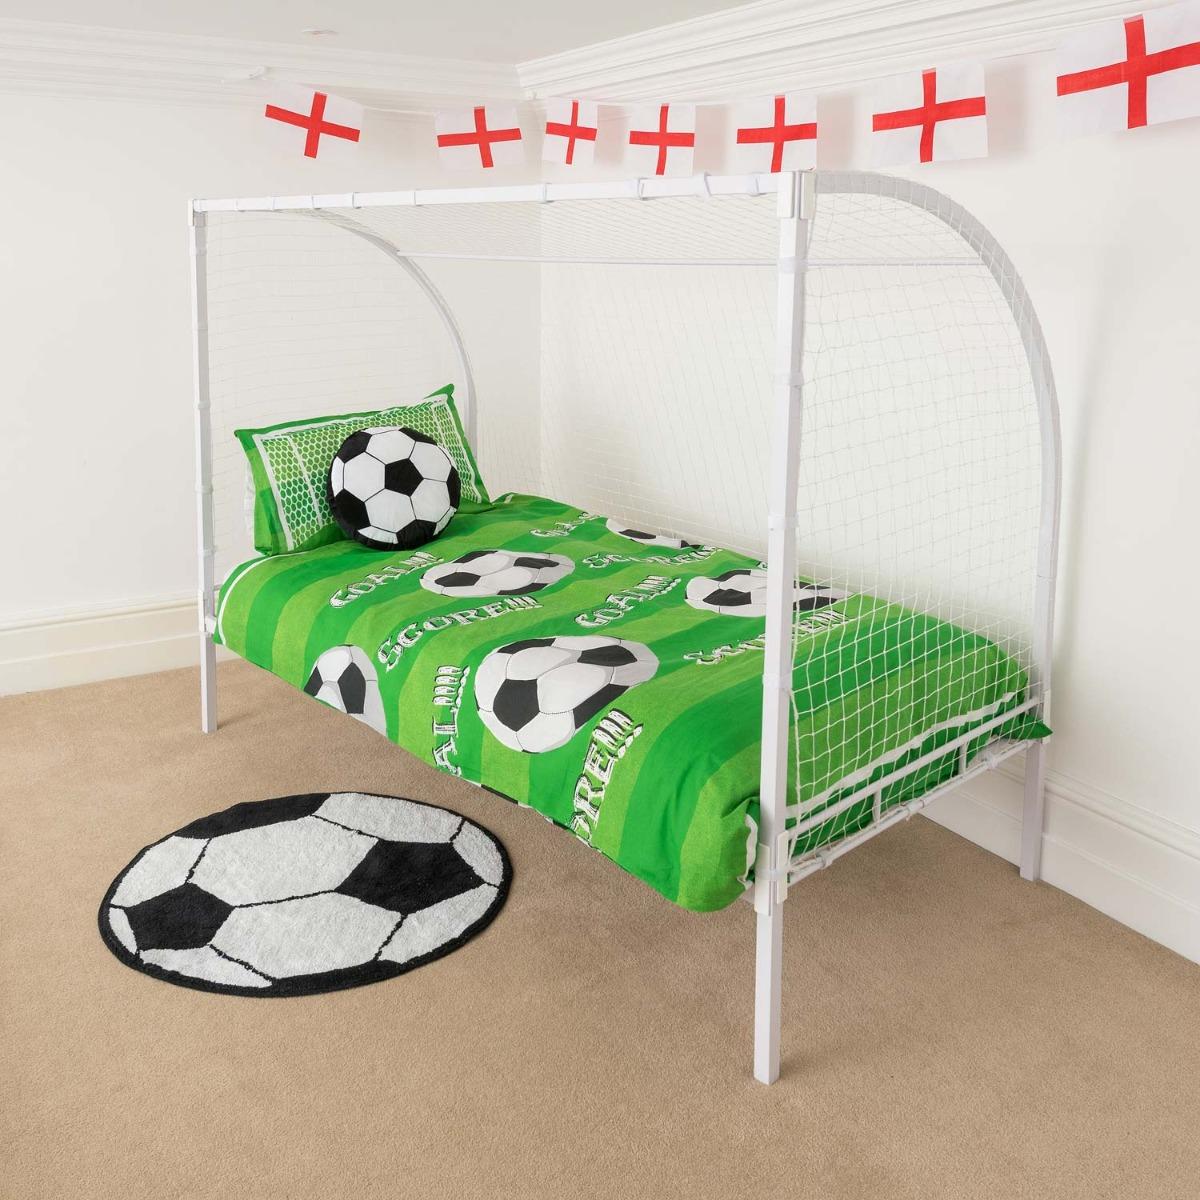 Image of Football Goal Bed Frame